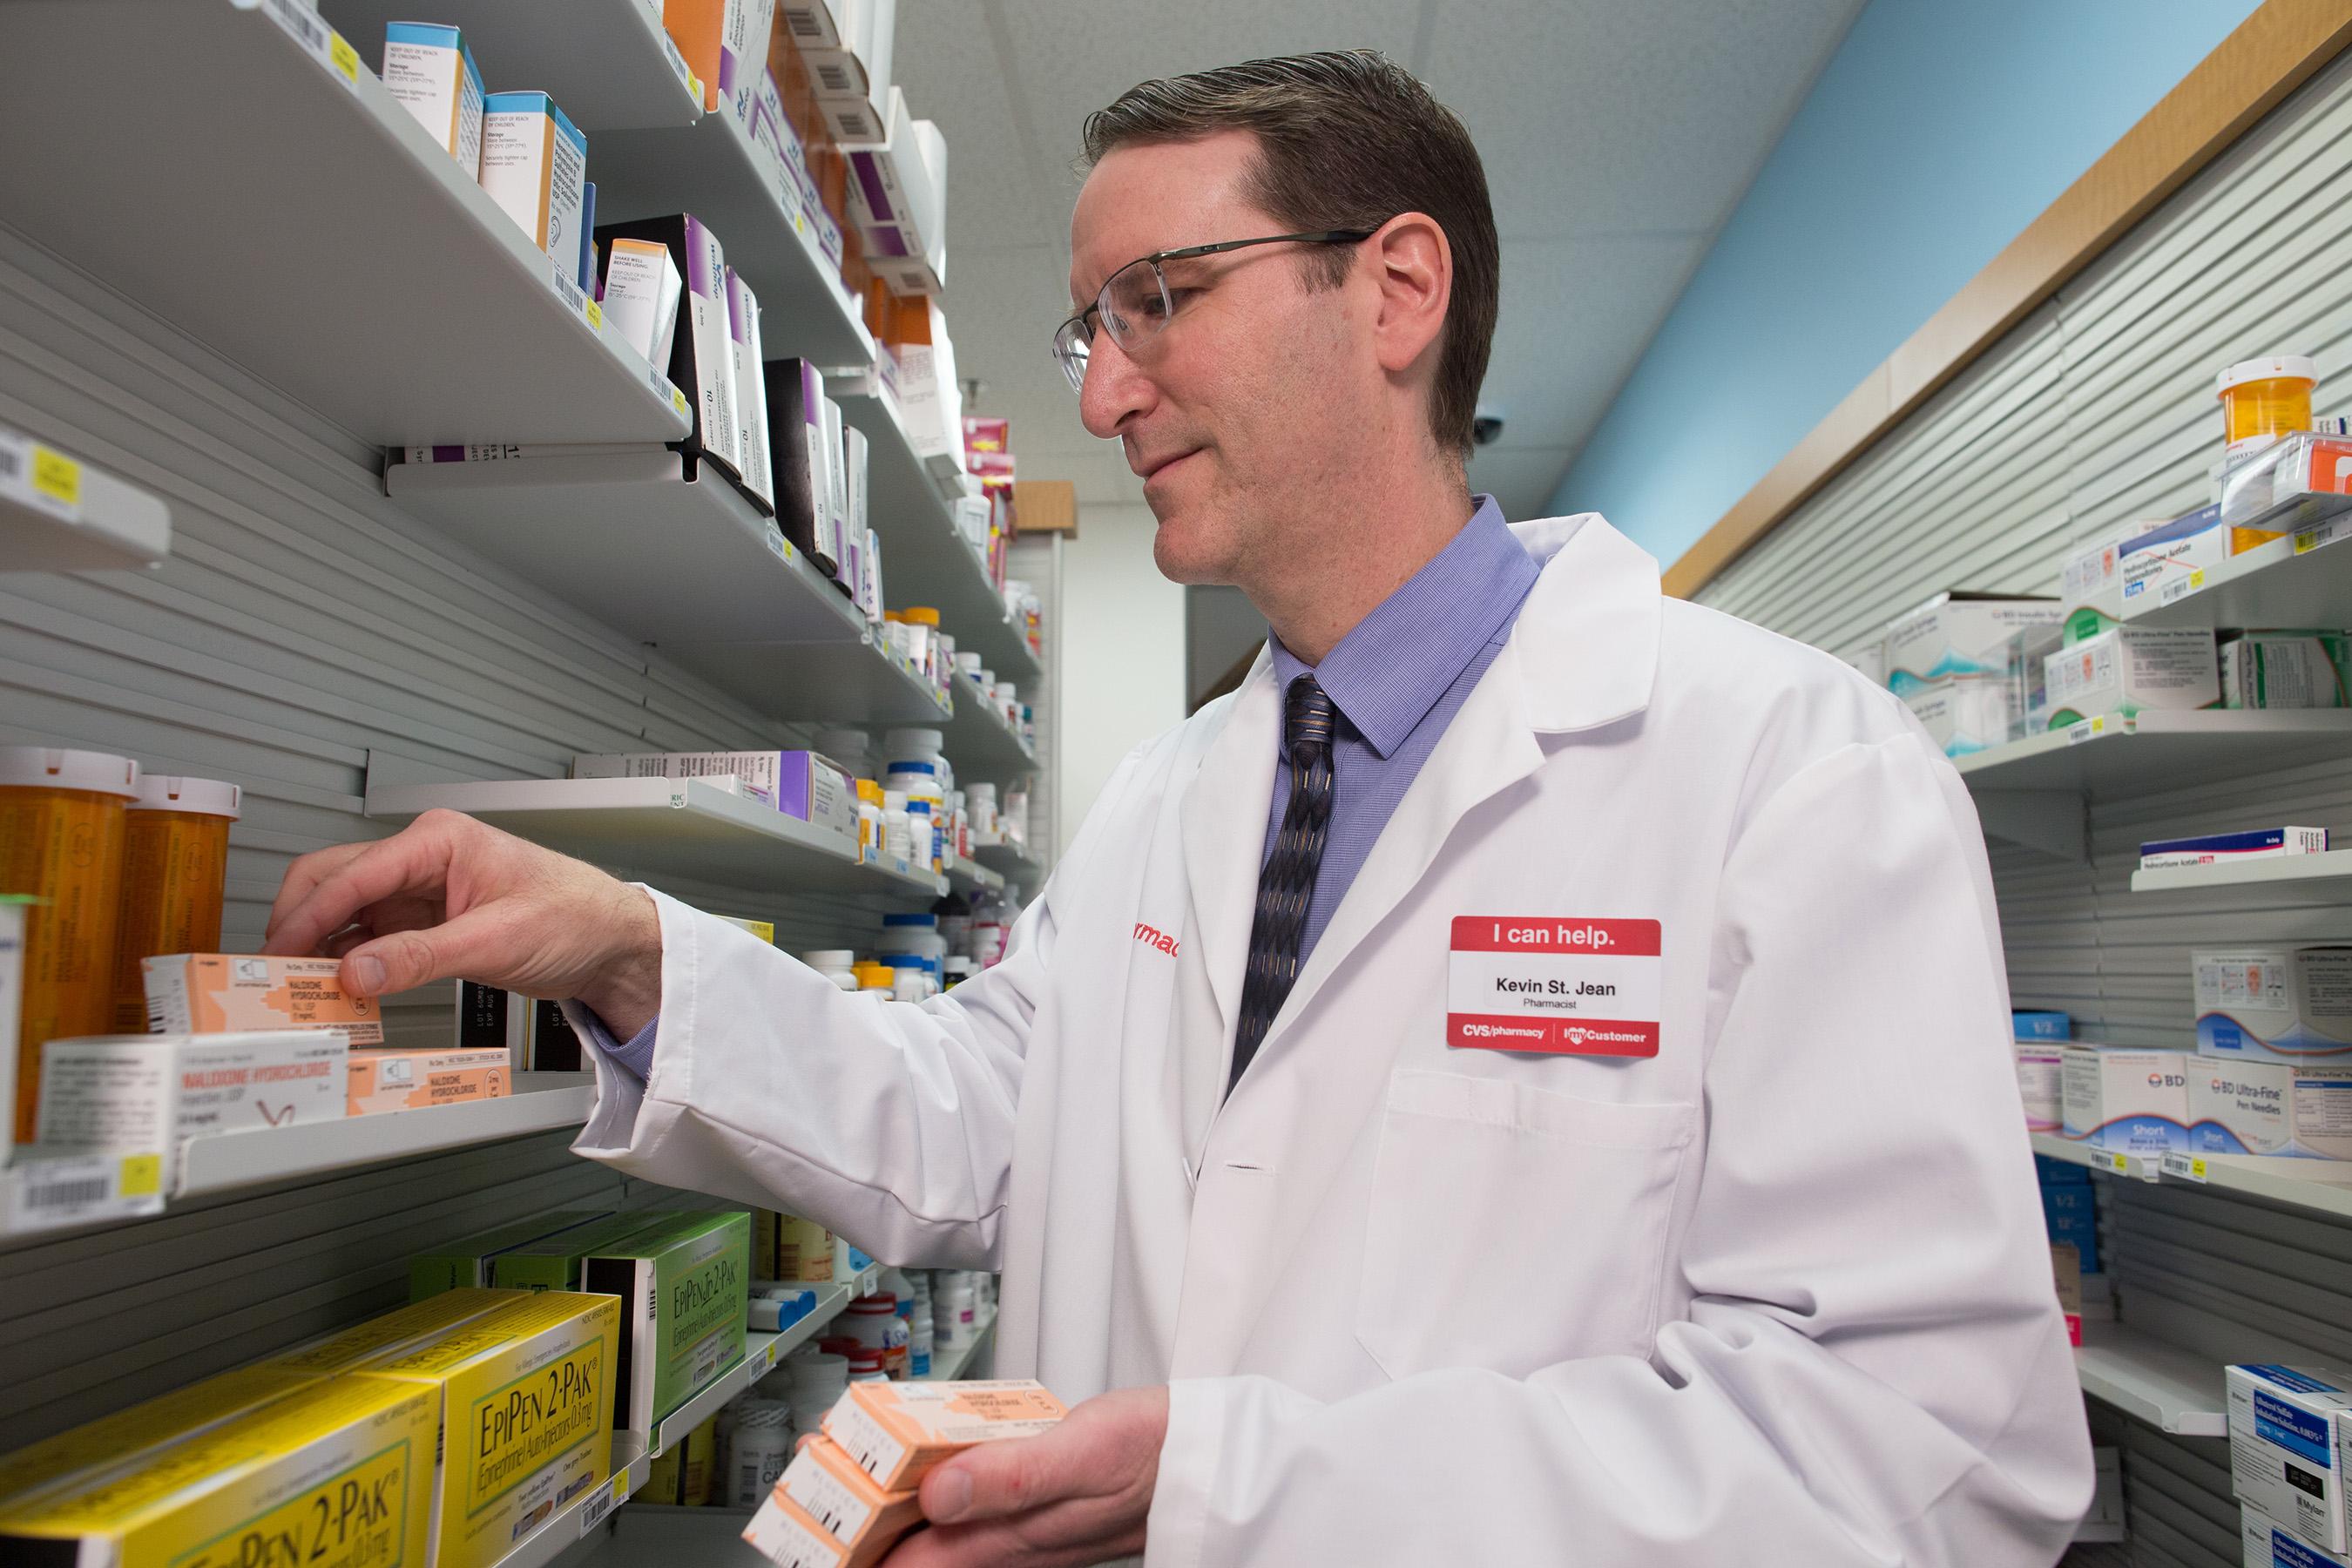 A CVS Pharmacist stocks the opoid-overdose reversal drug naloxone